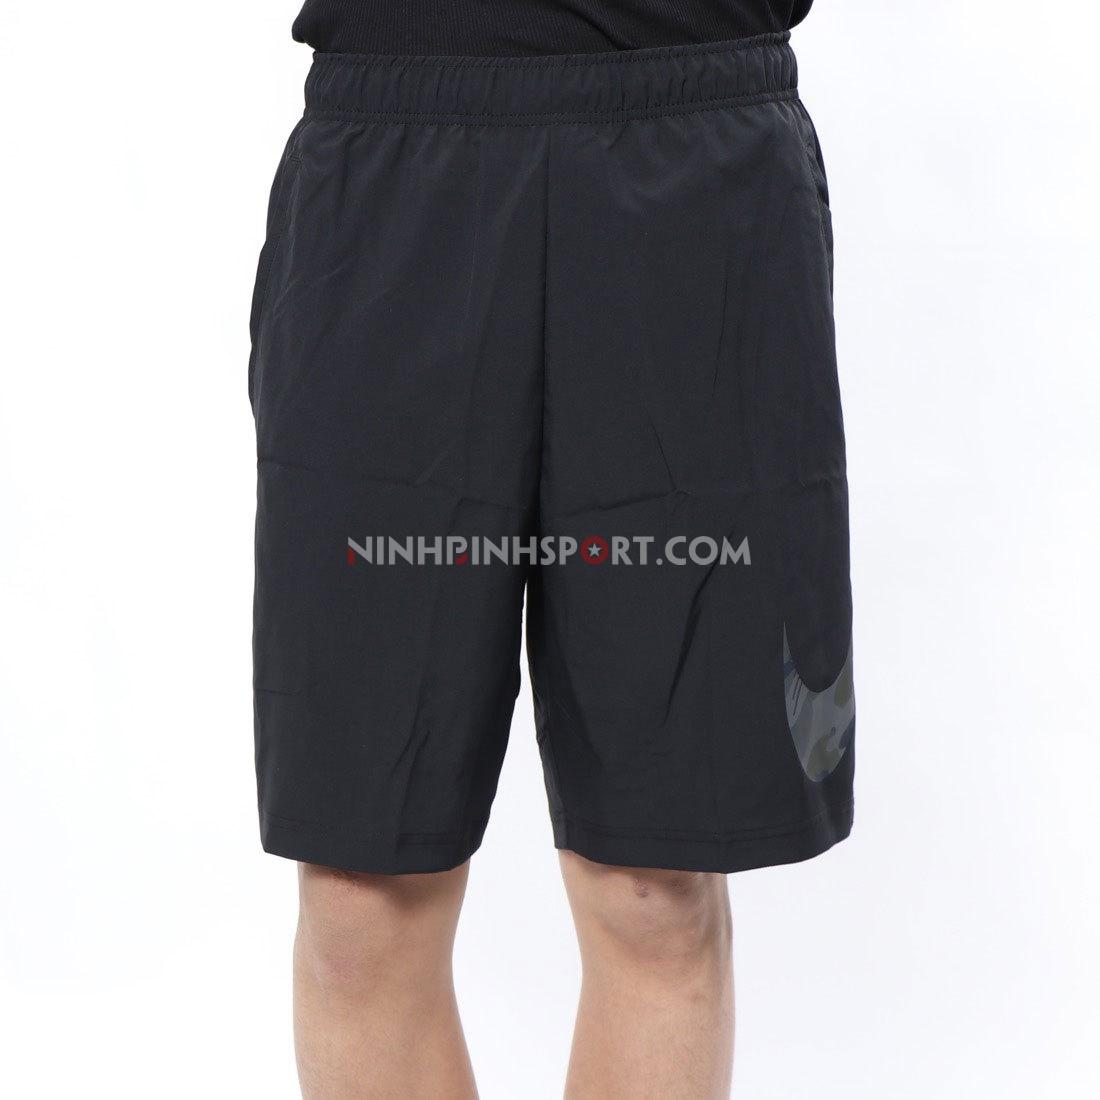 Quần thể thao nam Nike Dri-Fit Flex 2L Camo Black AT3368-010